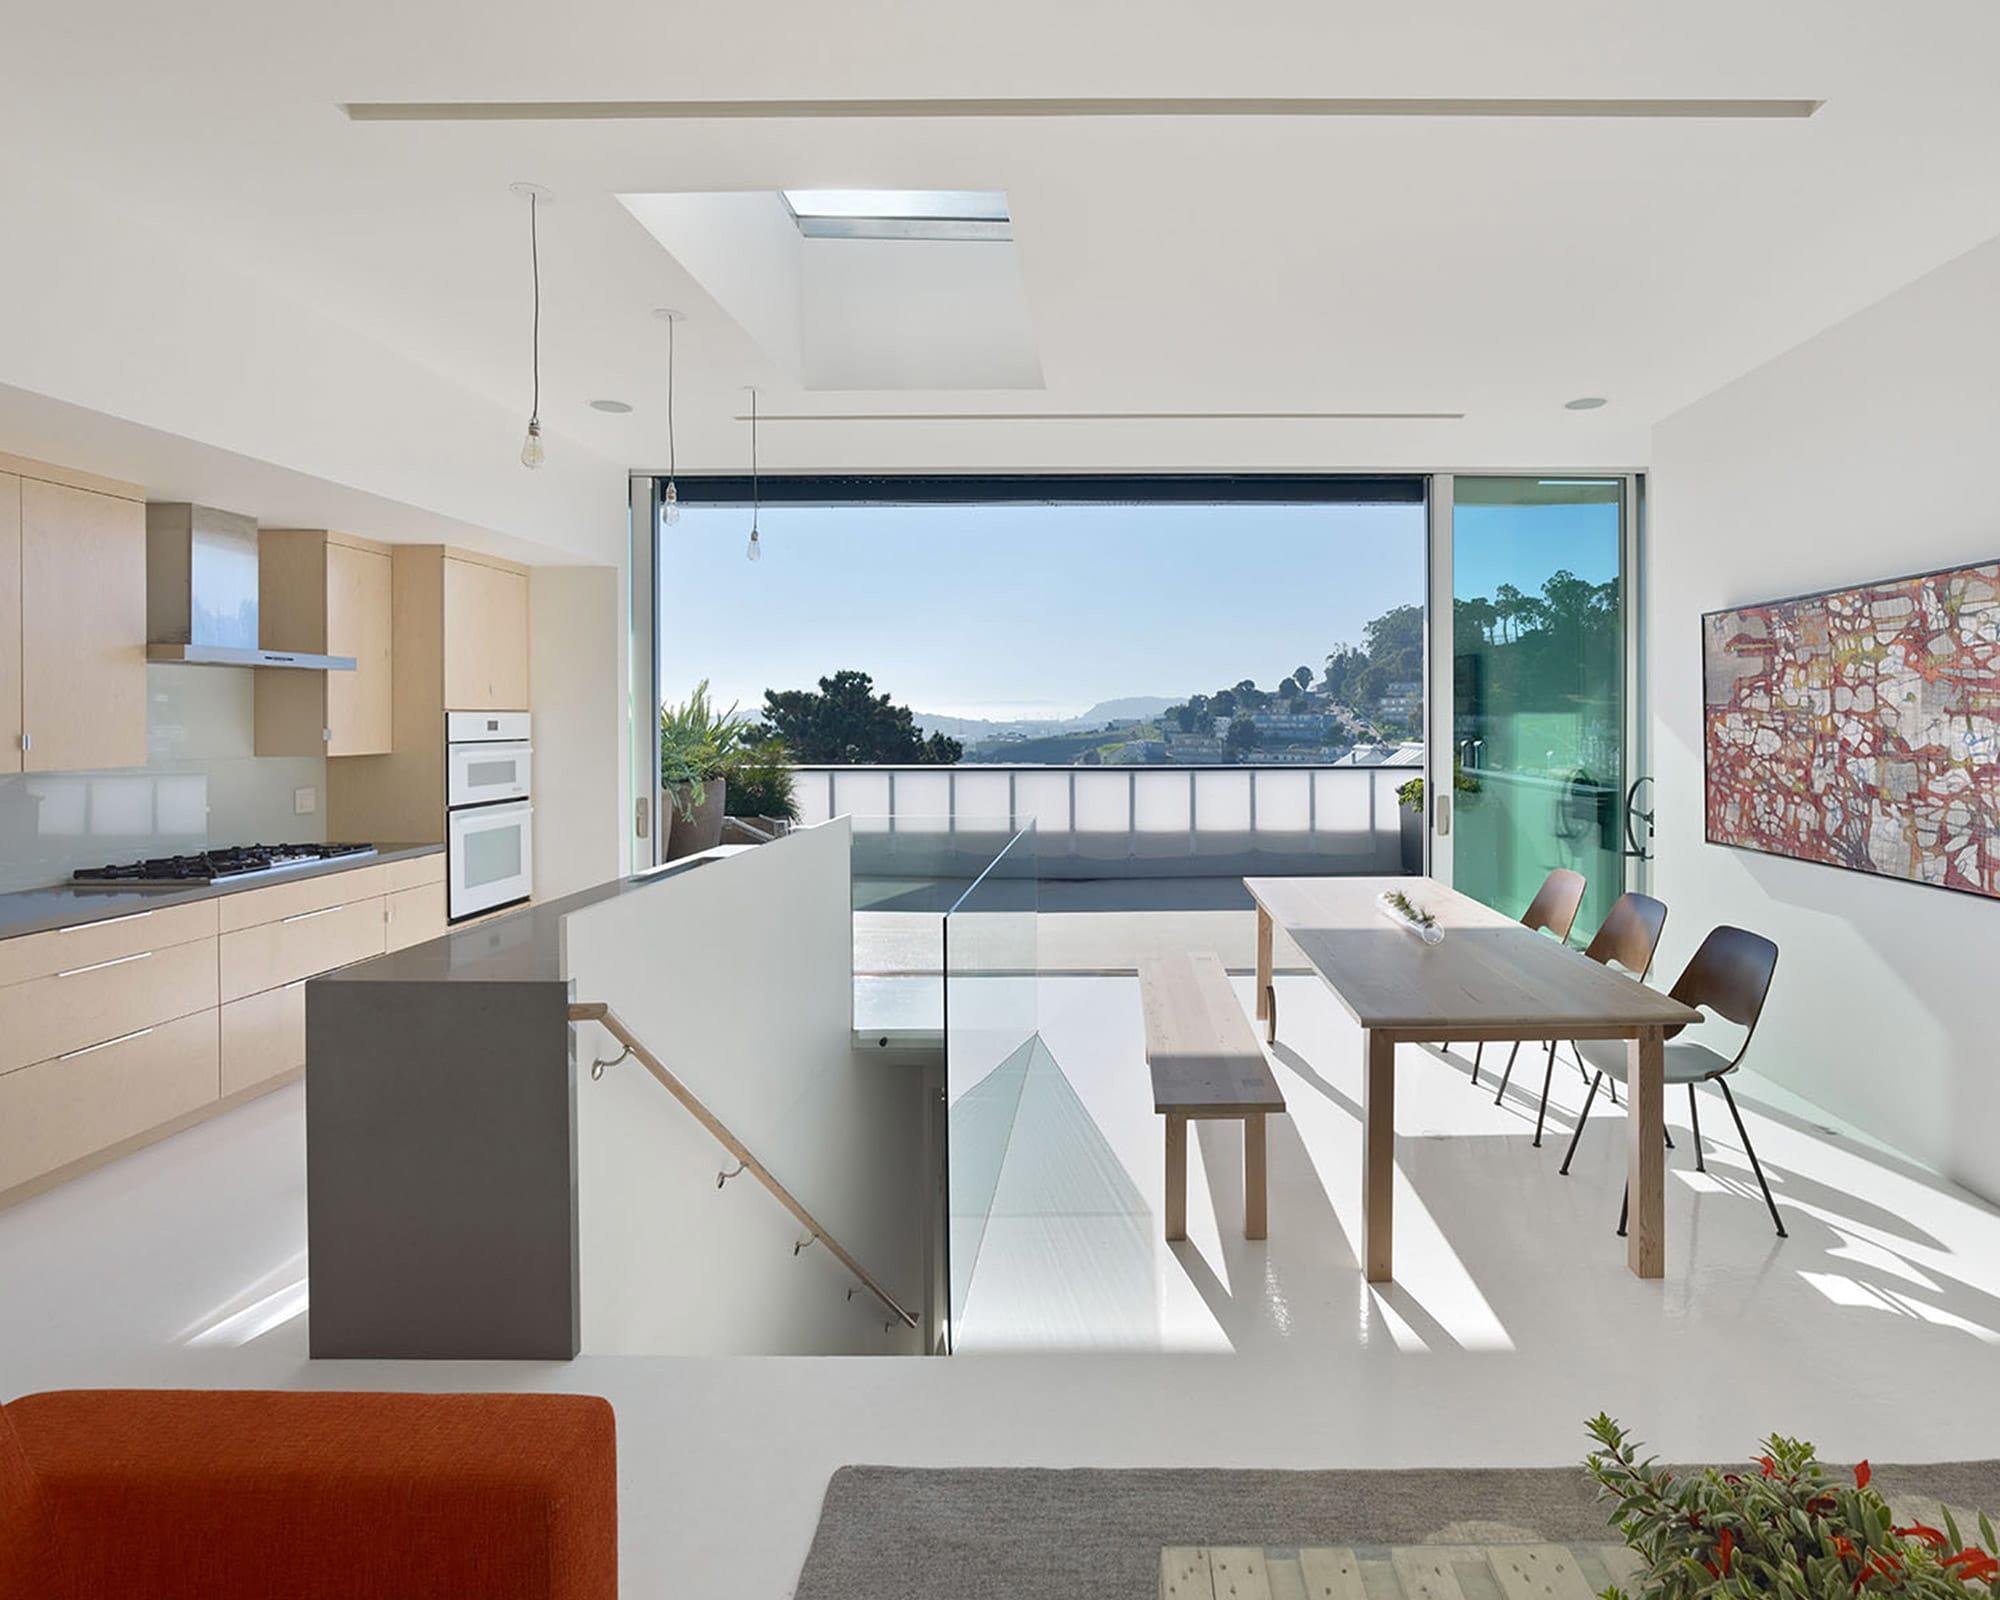 Mork Ulnes Architects Bruce Damonte 183 20th Street 183 Divisare